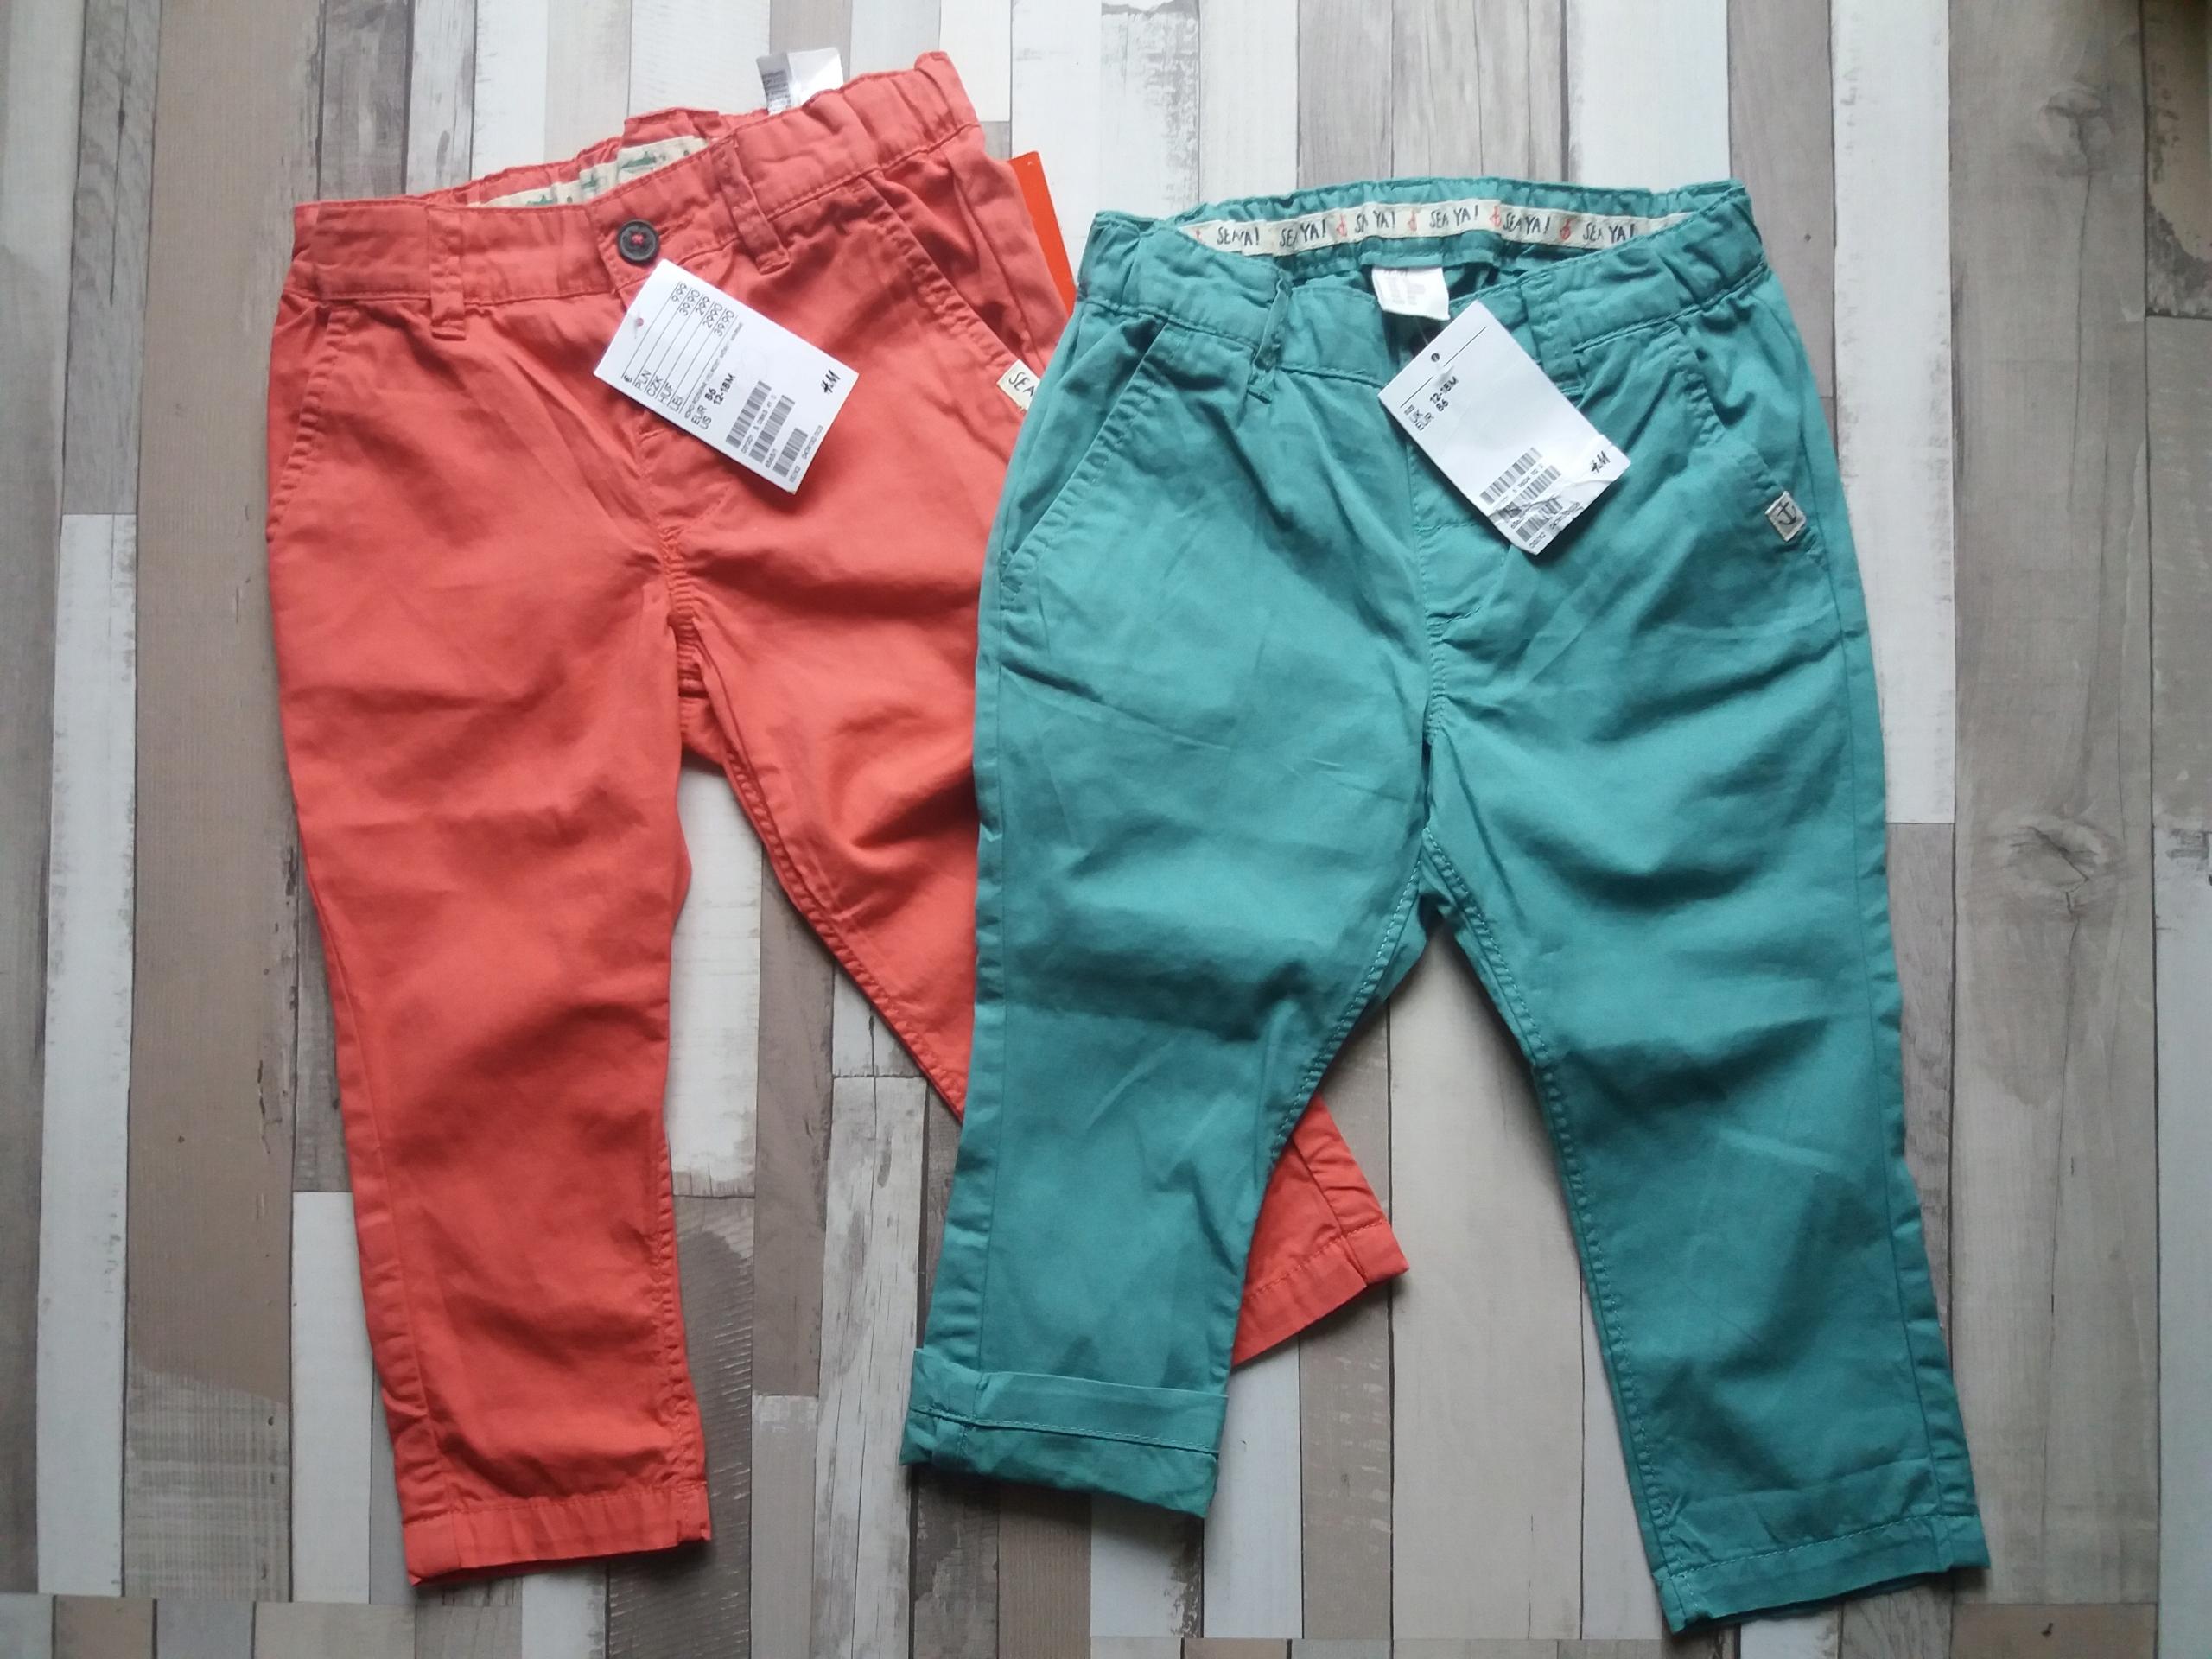 NOWE 2 pary spodni chinos marki h&m r. 86